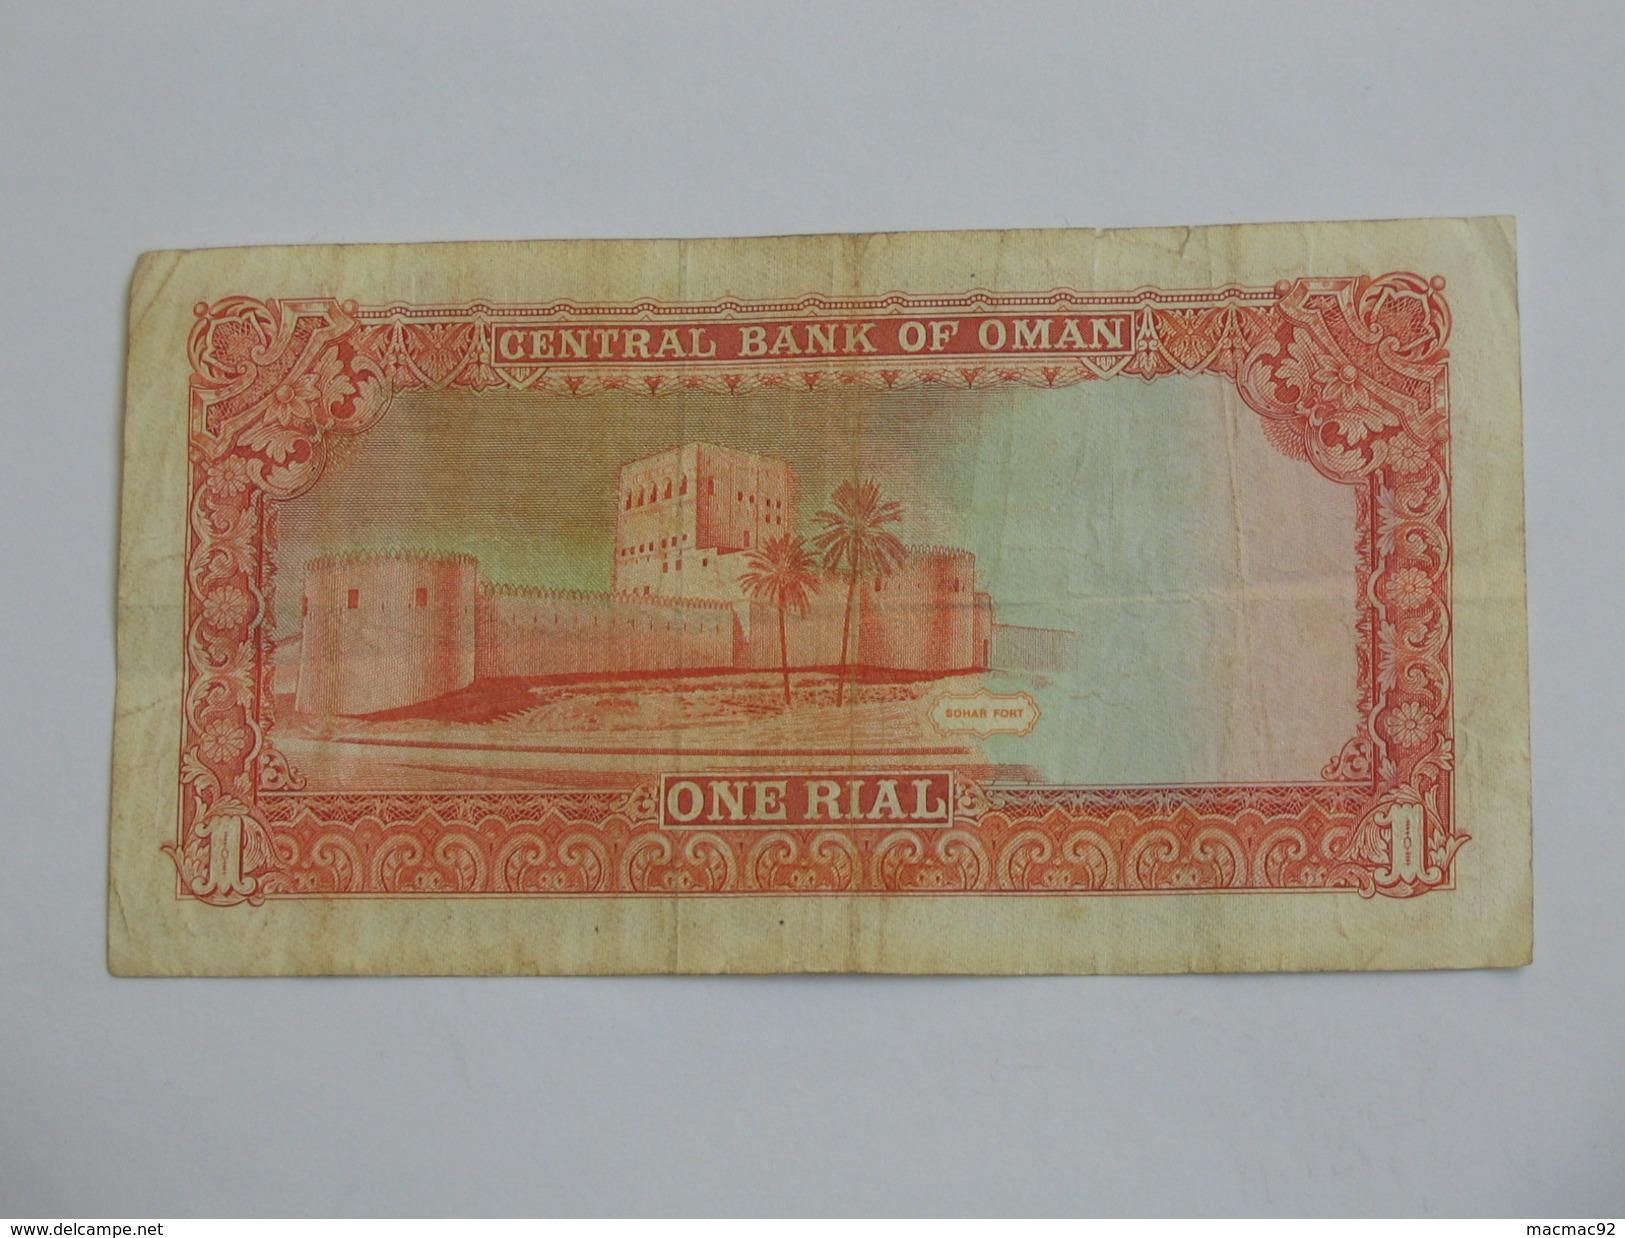 1 One Rial 1987 ? - OMAN - Central Bank Of Oman **** EN ACHAT IMMEDIAT ***** - Oman